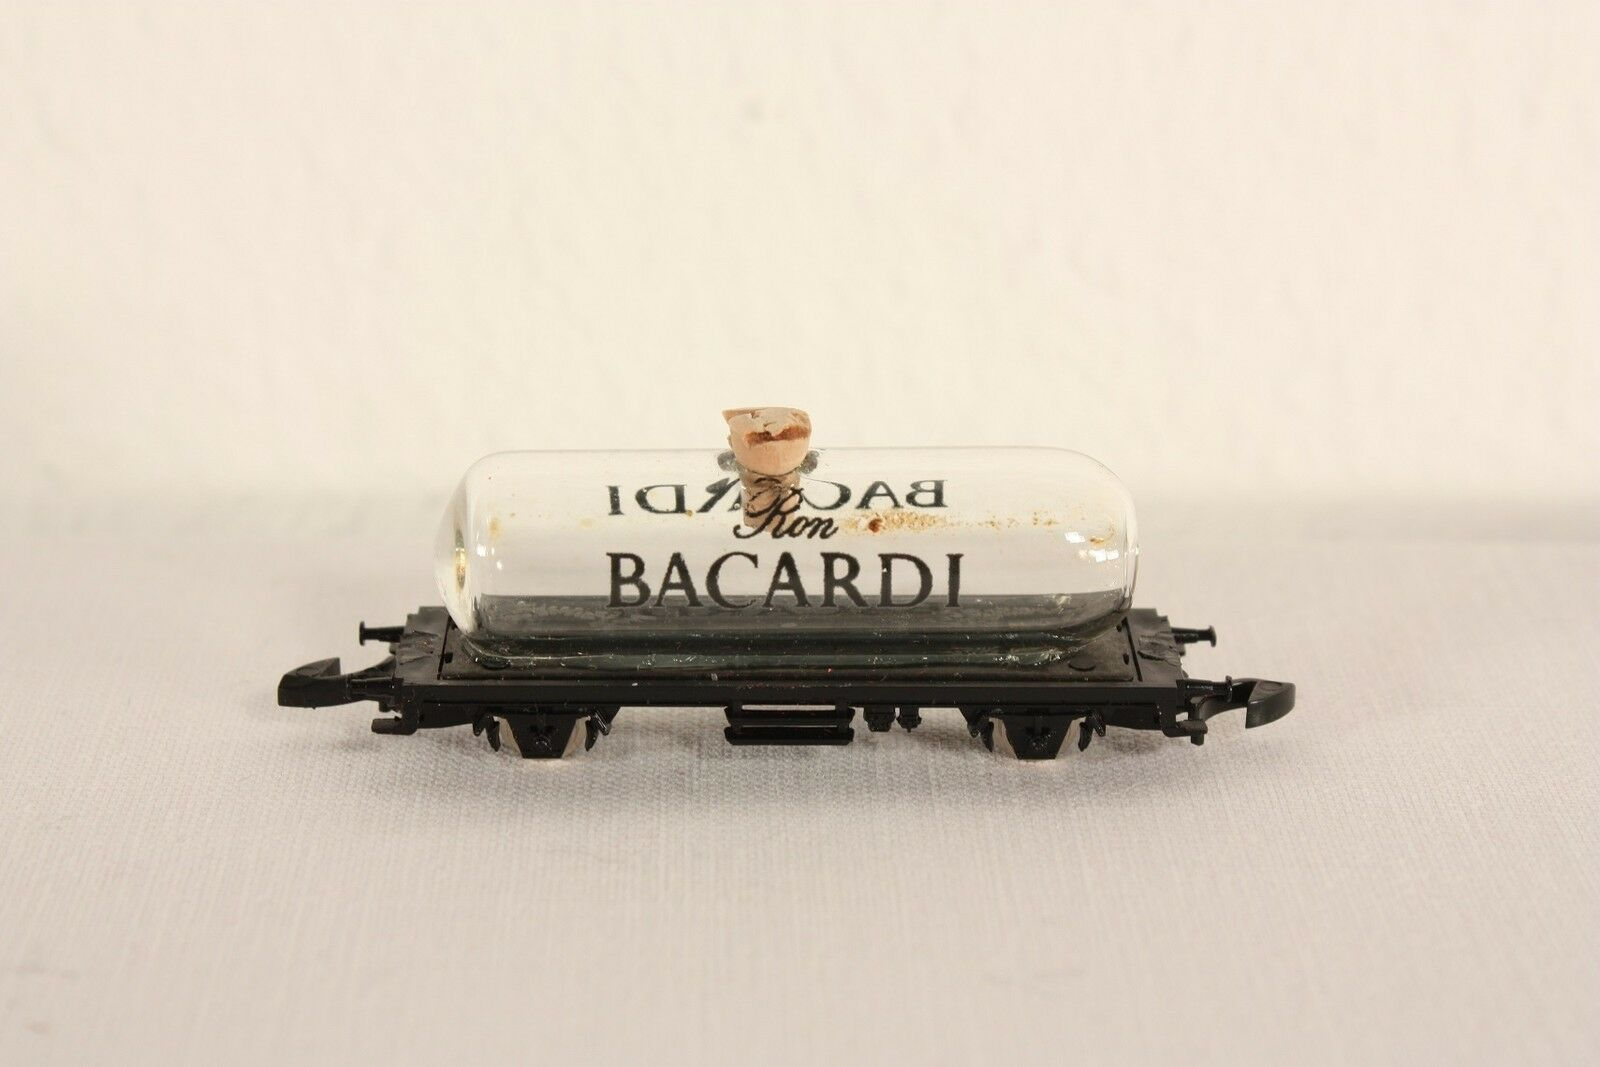 Traccia Z,  Bacardi  vetro Caldaia Carrello, 1:220,  ab871 Top